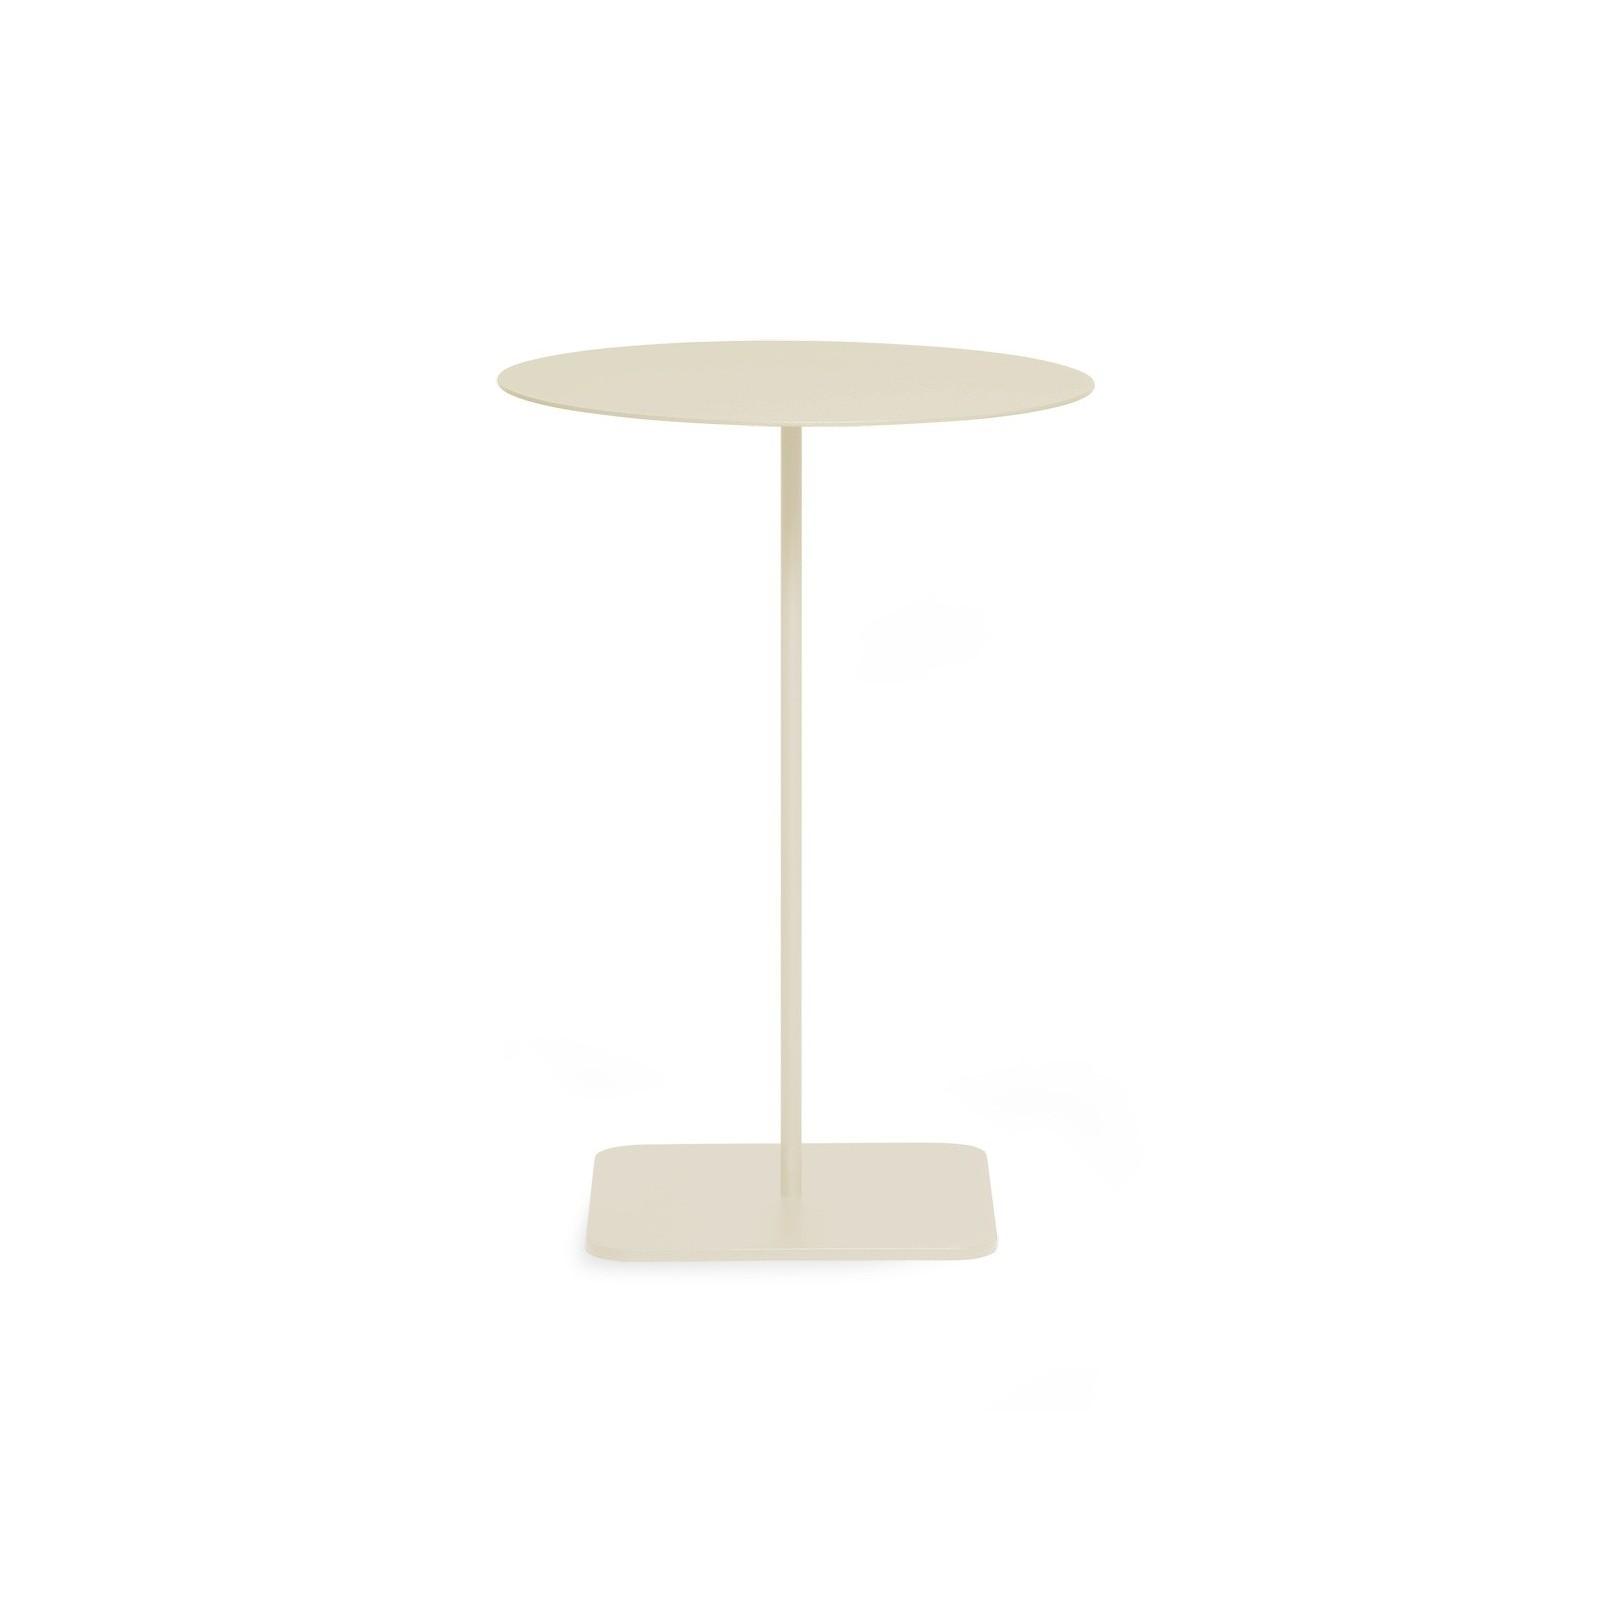 Mesita coffee table - 57 - beige